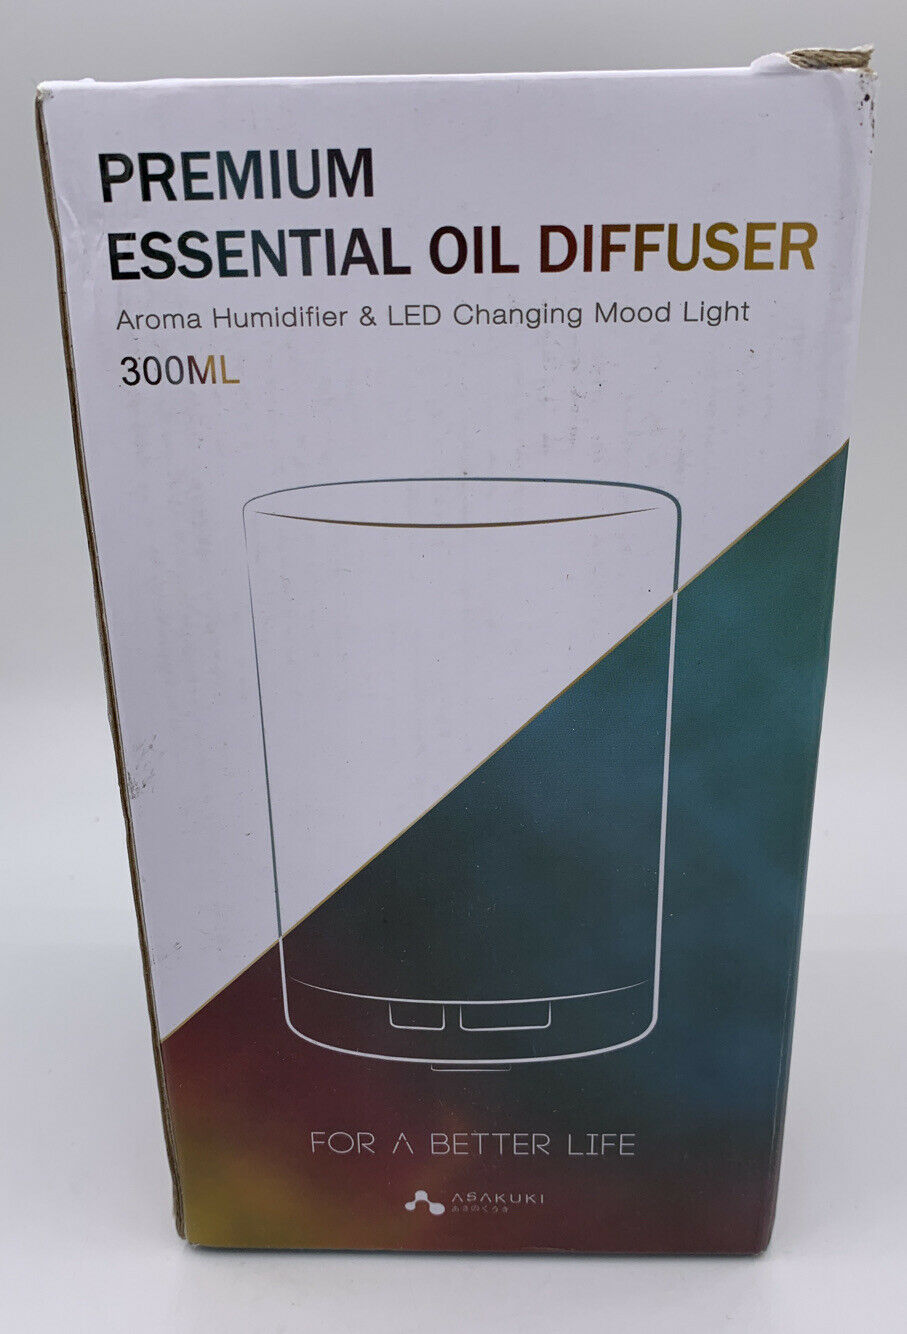 ASAKUKI Home Fragrance 300ML Premium, Essential Oil Diffuser, Quiet 5 In 1 With